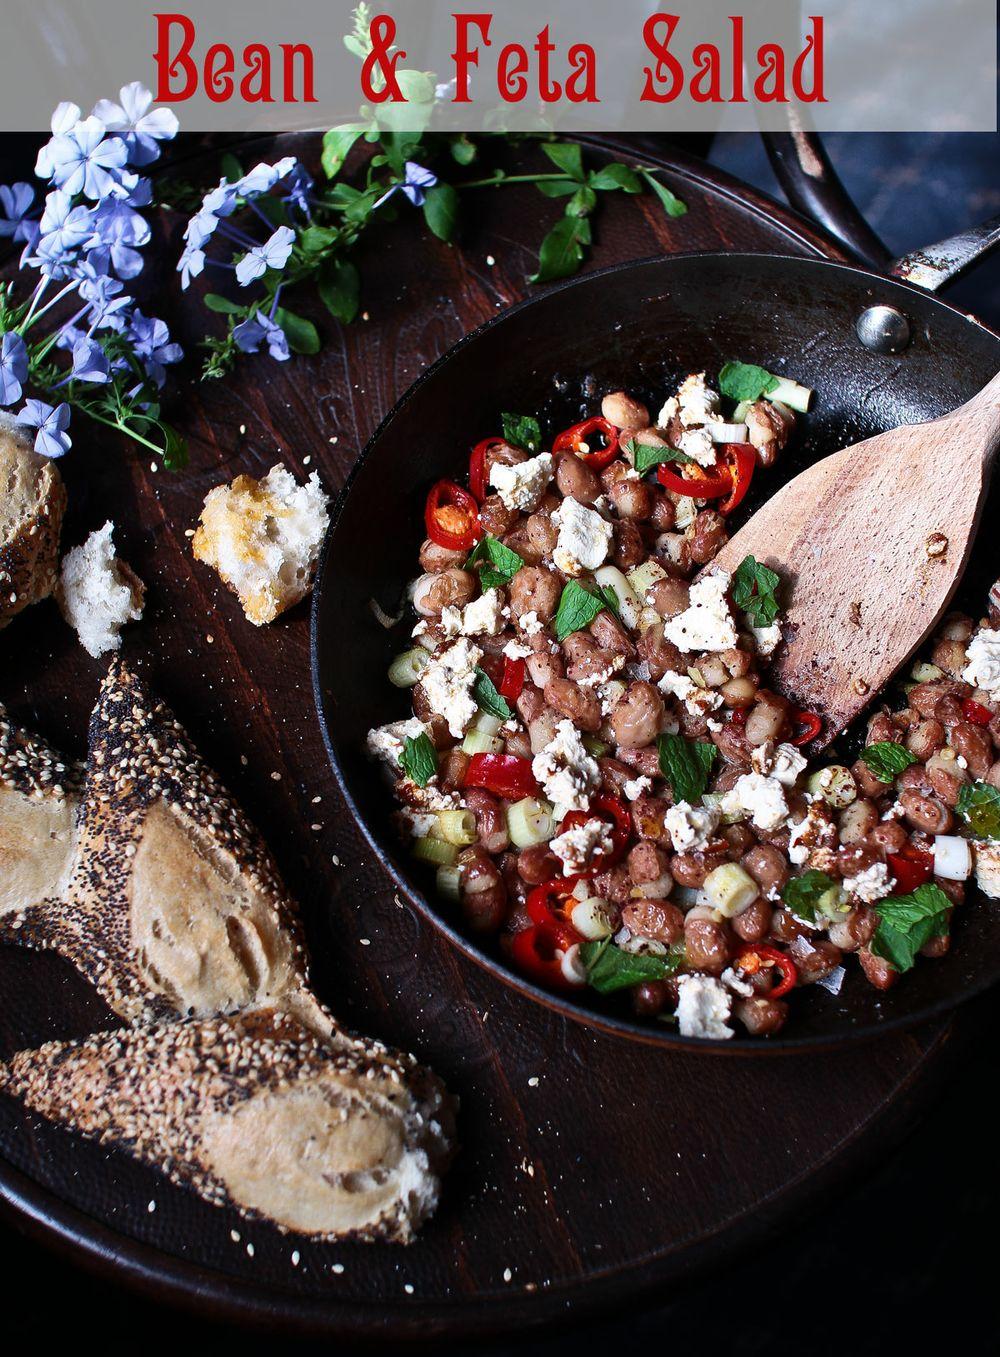 Ottolenghi Inspired Borlotti Bean & Feta Salad